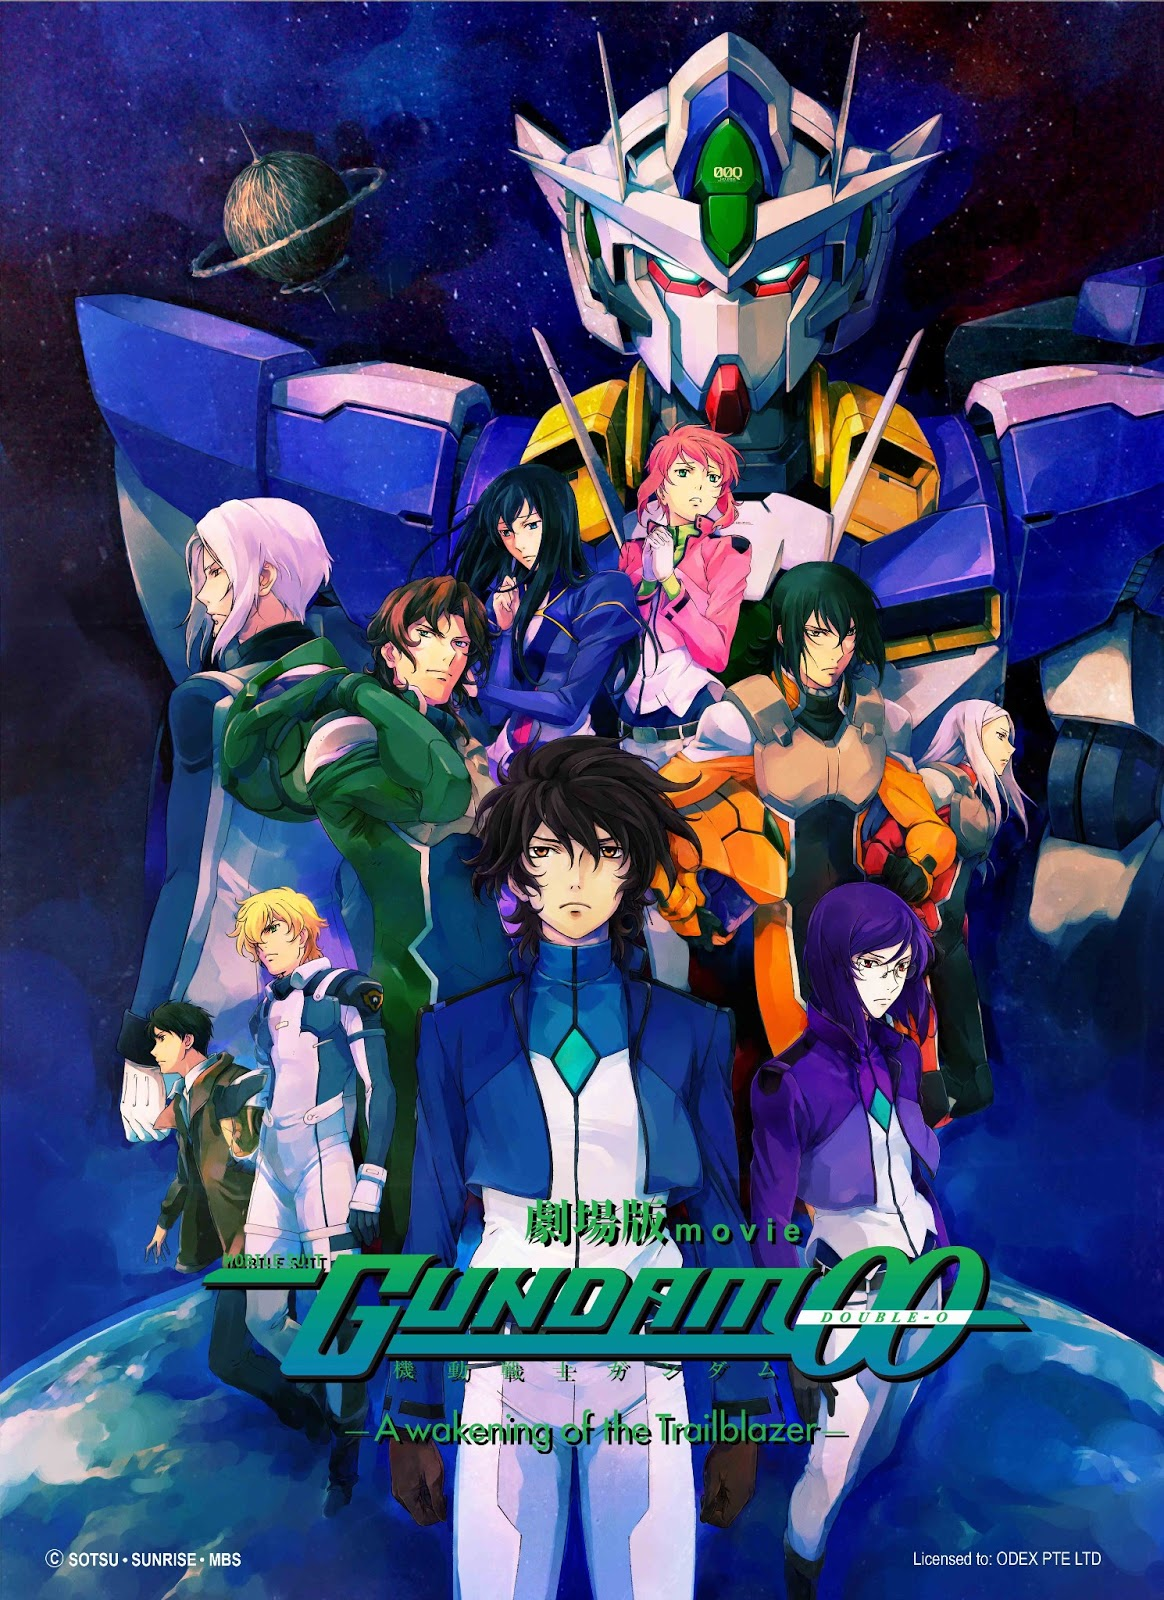 Gundam 00 awakening of the trailblazer ending